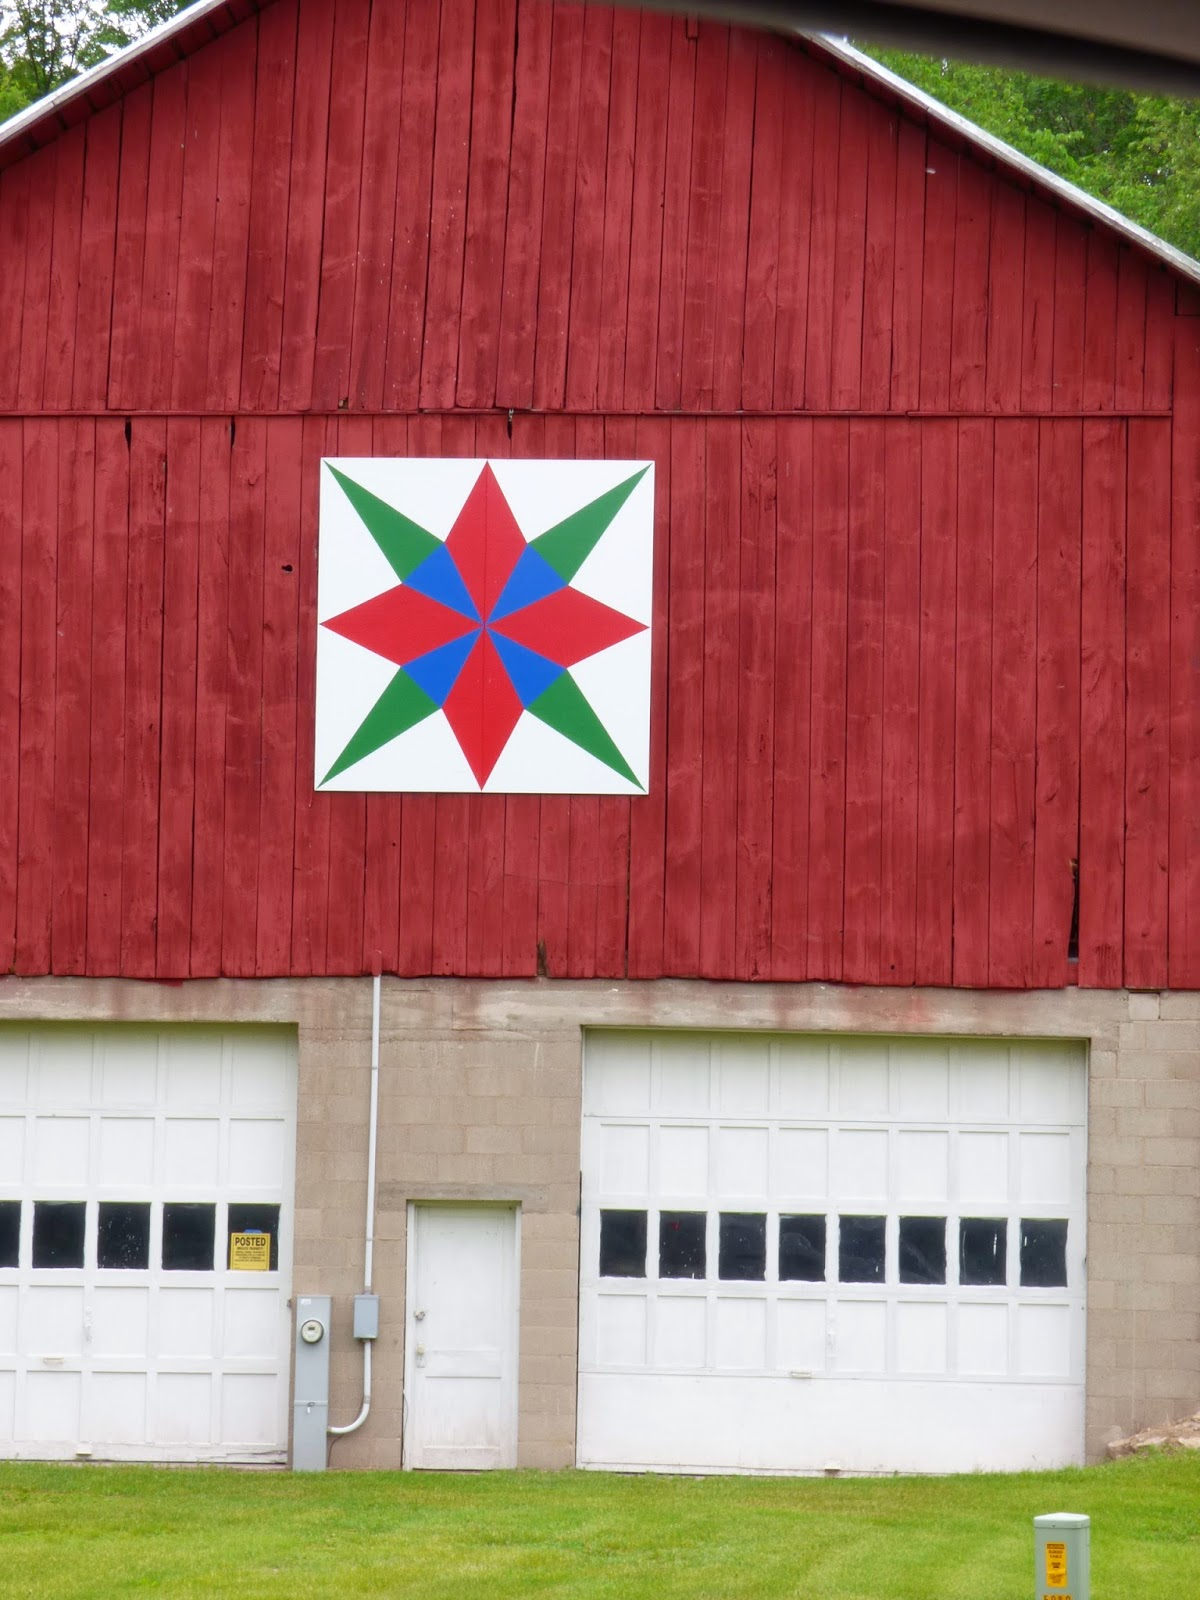 Quilt Patterns On Wisconsin Barns : Barn Quilt Patterns Free Joy Studio Design Gallery - Best Design